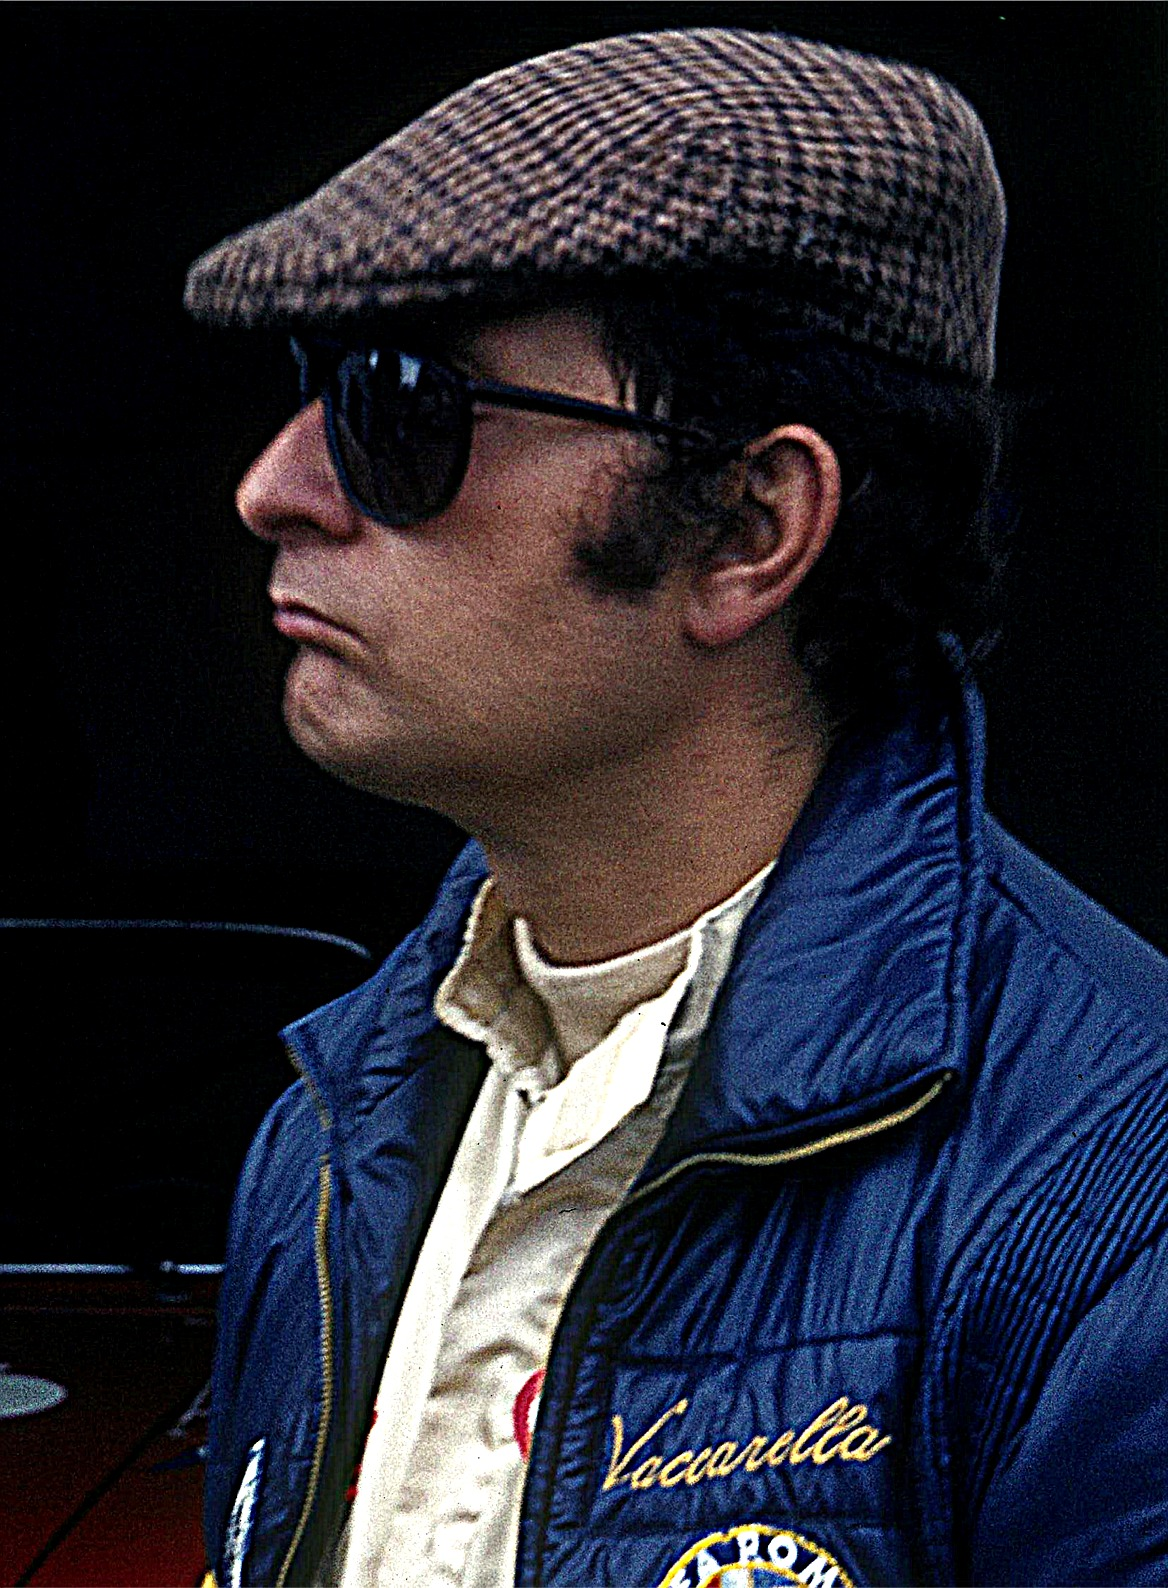 Nino Vaccarella Wikipedia